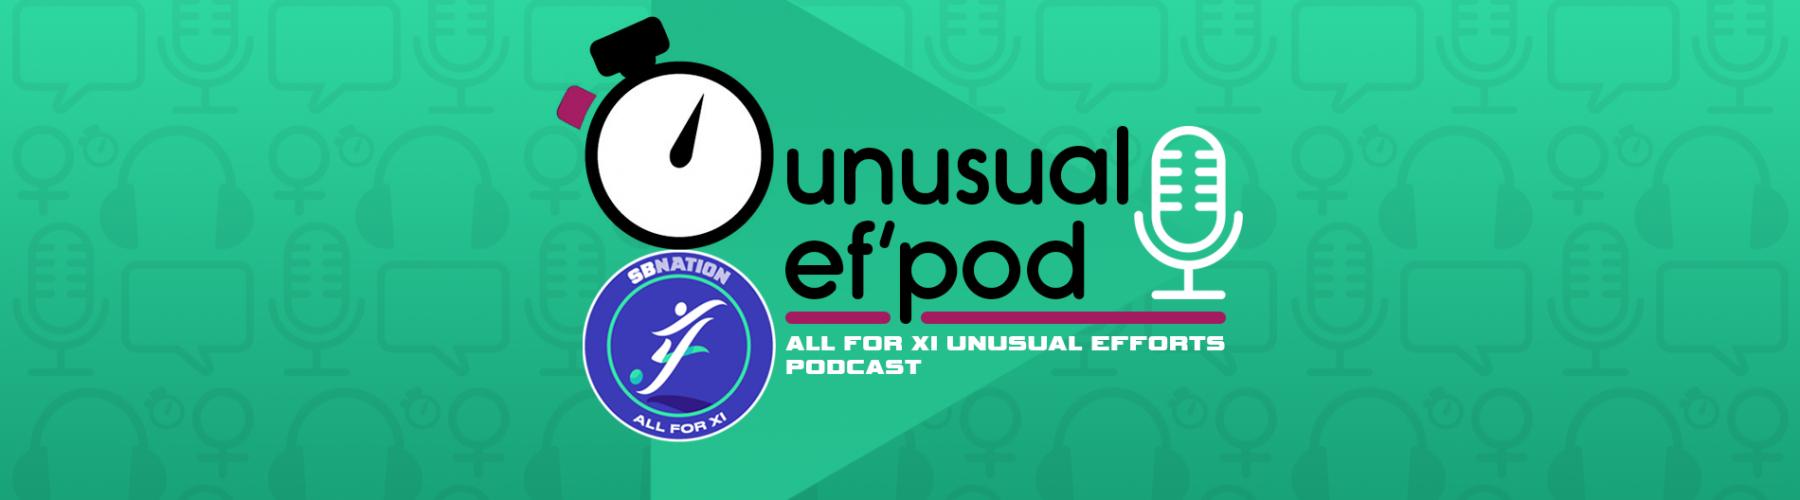 Unusual Ef'pod Episode 31: Oatmeal Spoons